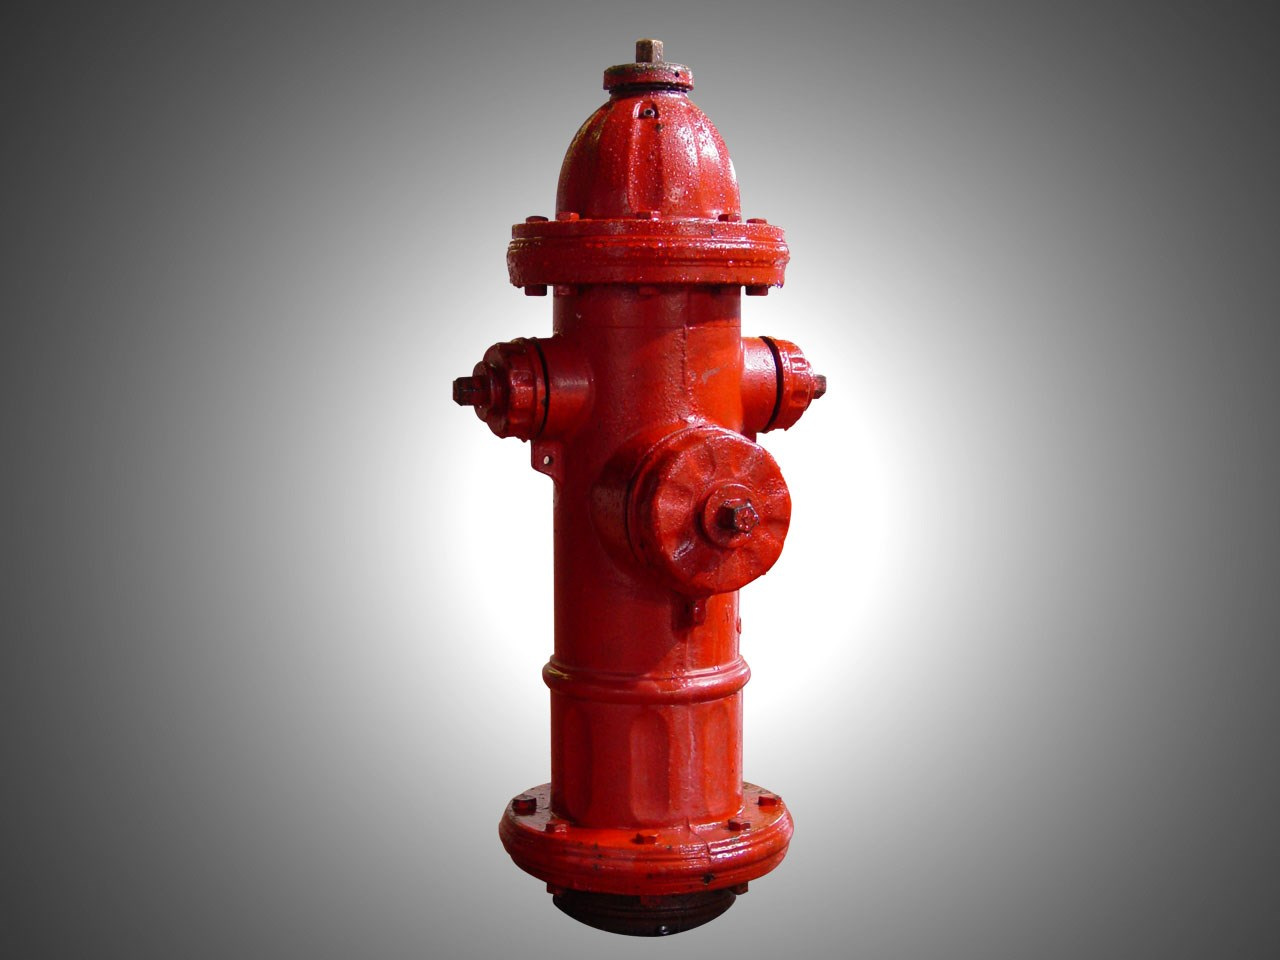 fire hydrant_1501882381756.jpg